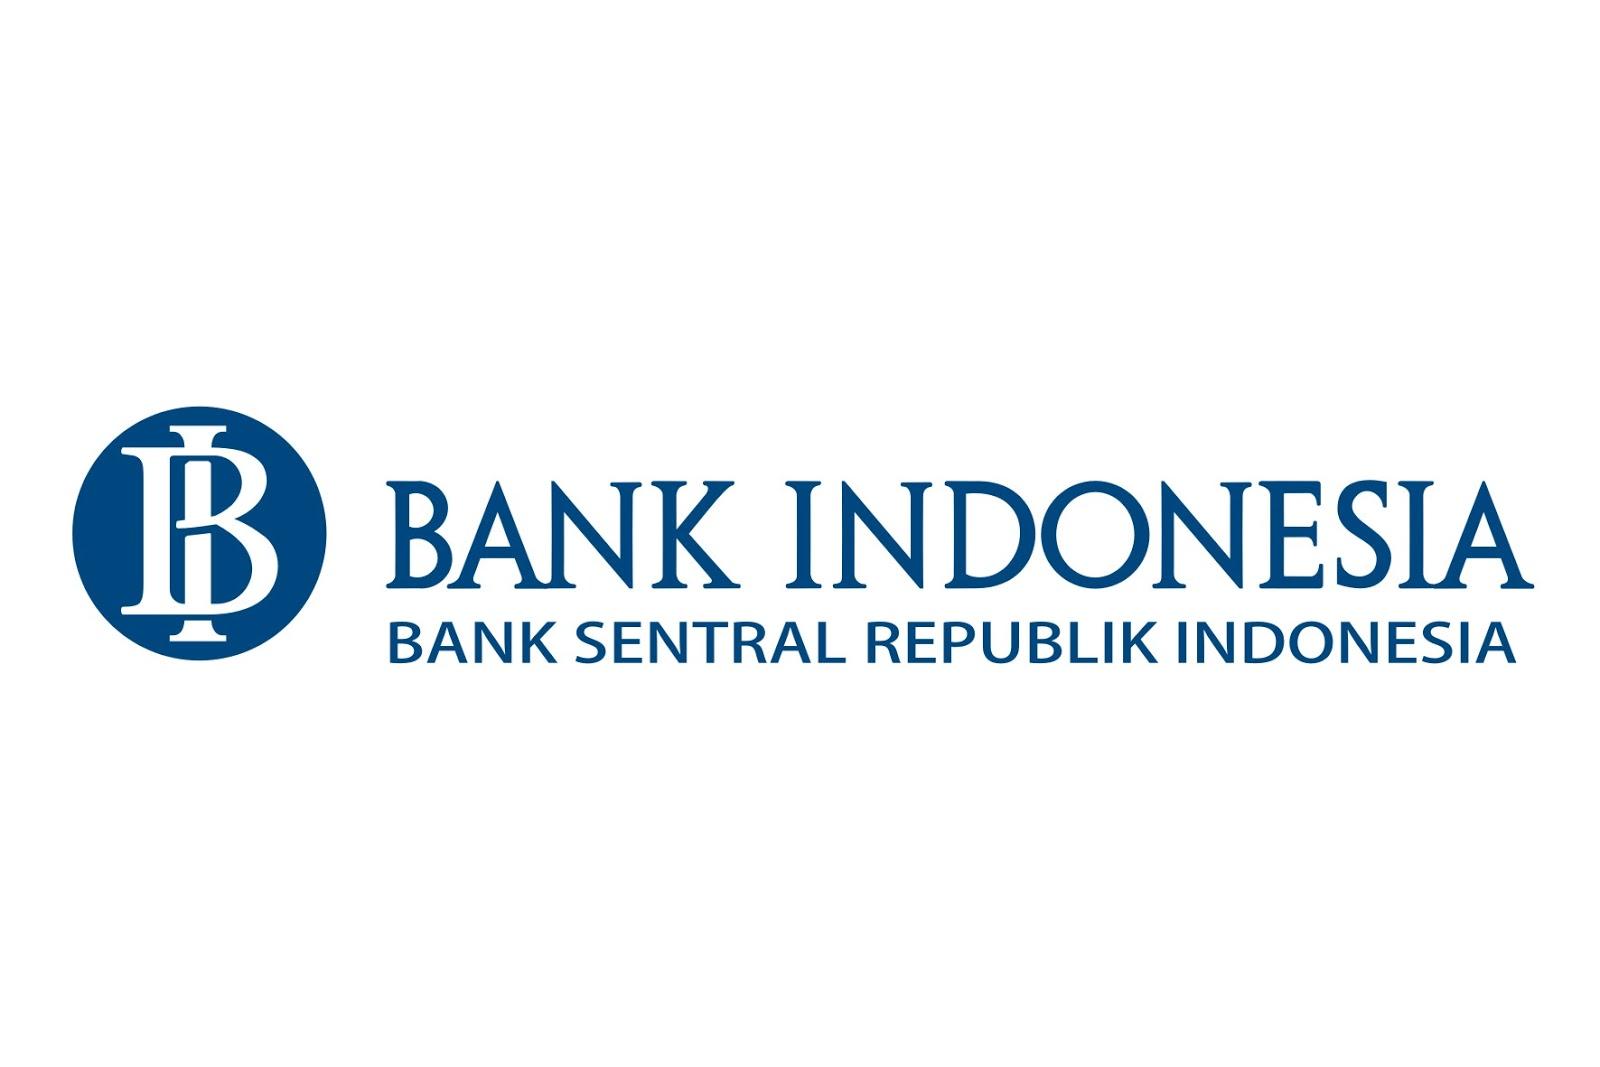 bank logos - photo #38